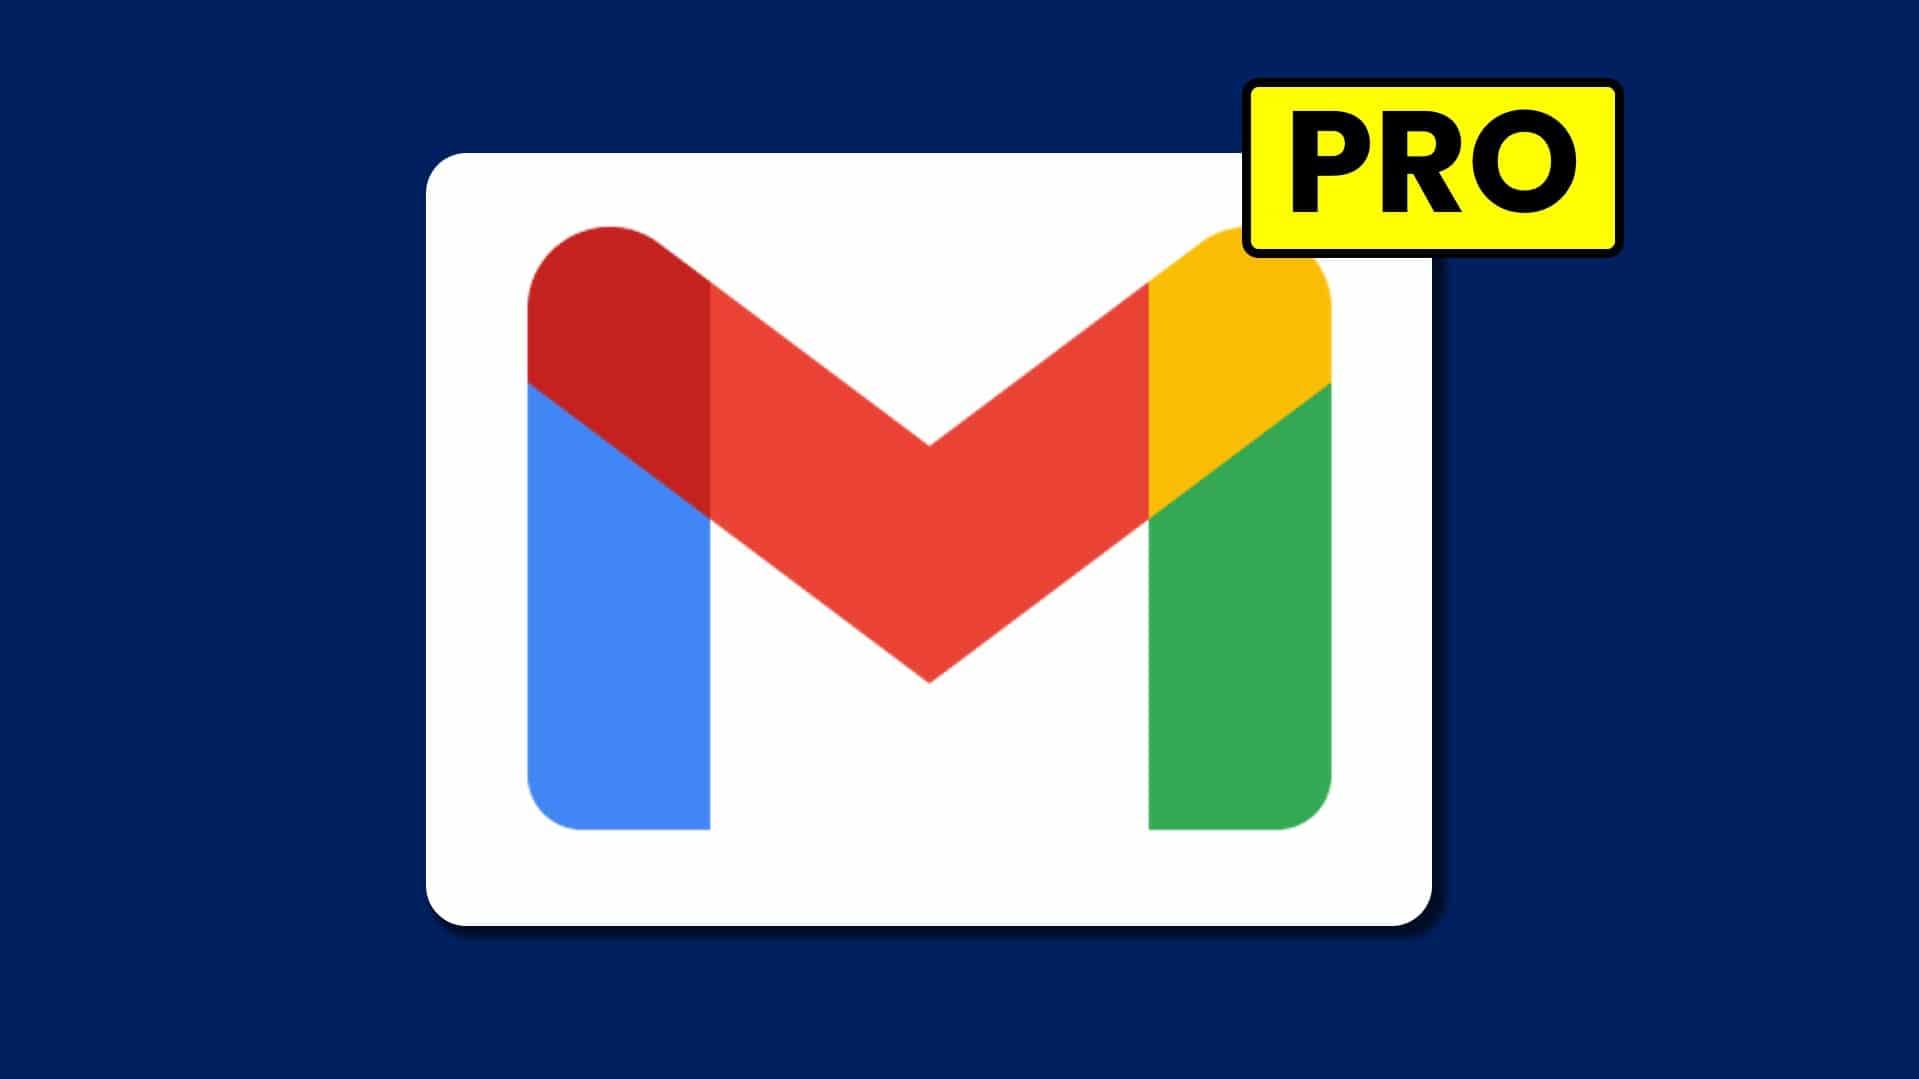 Logo gmail en fondo azul, El Tío Tech